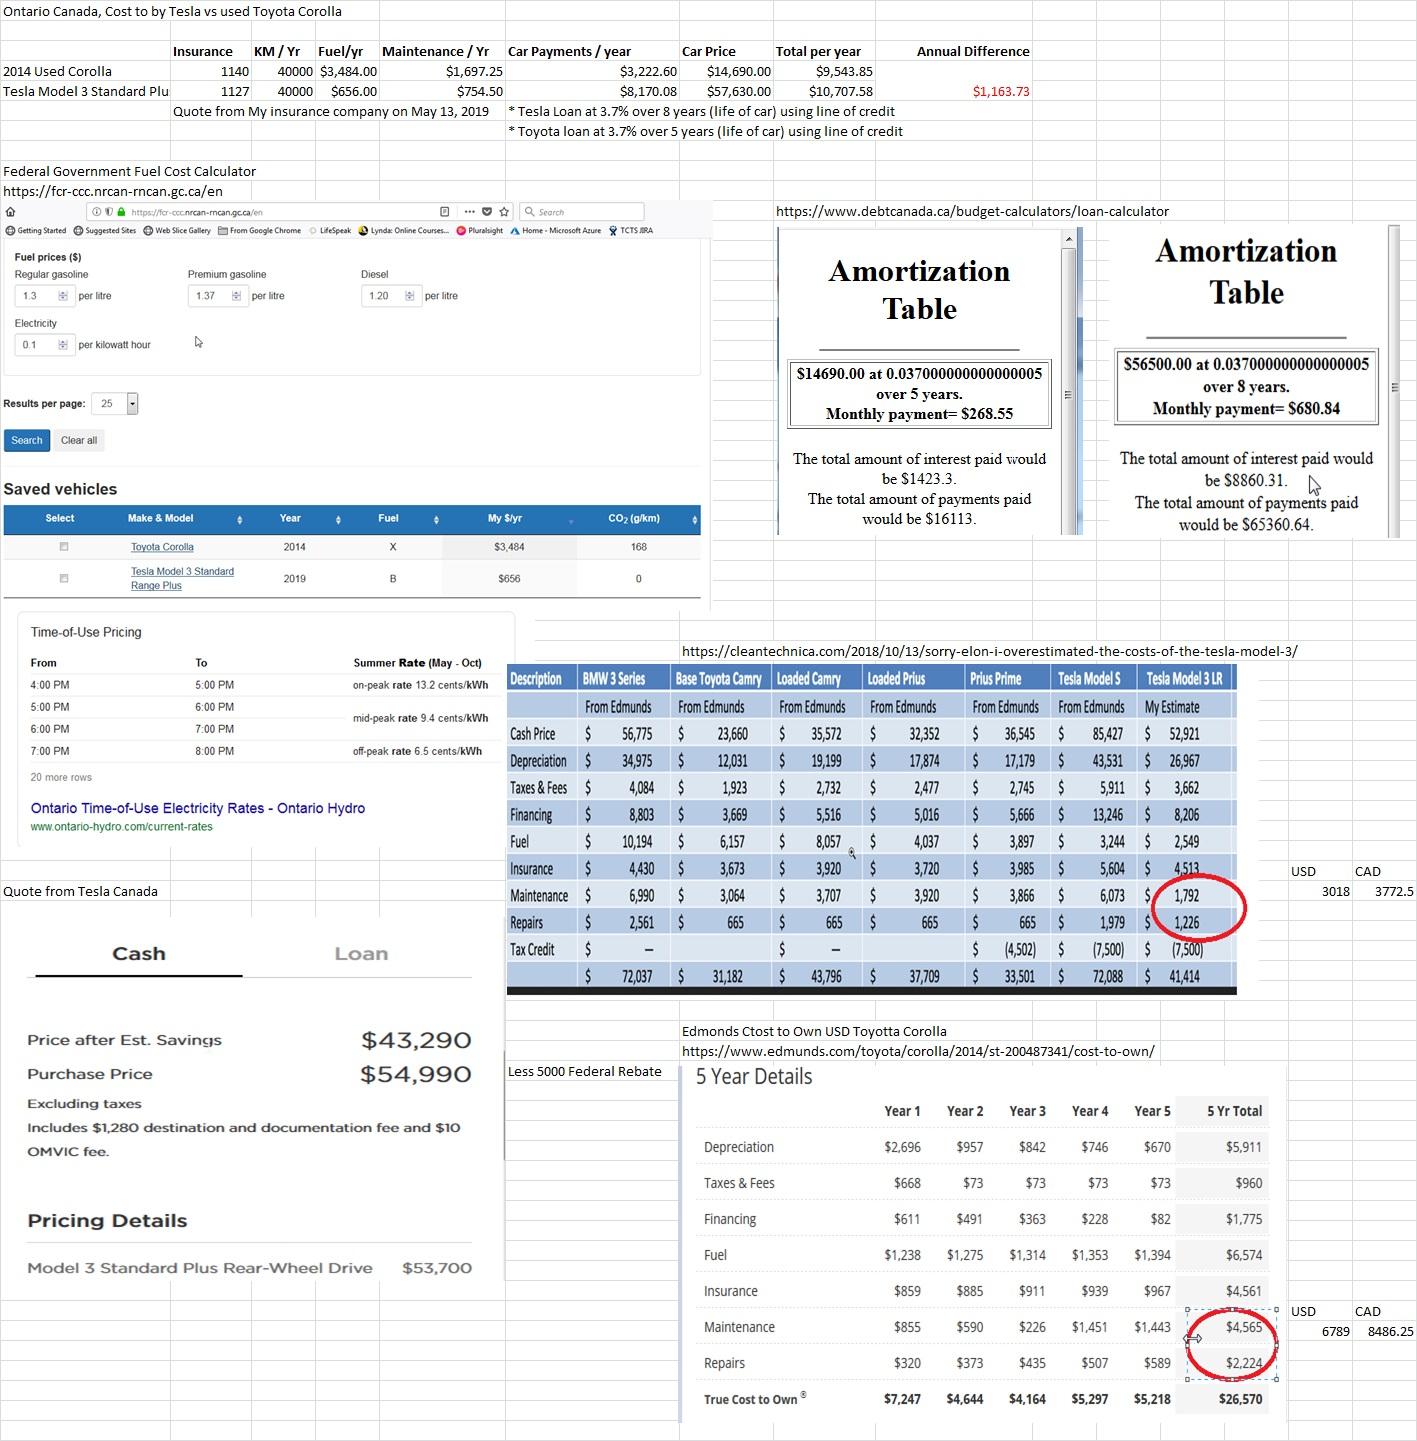 Ontario-Canada-UsedToyotaCorolla vs TeslaModel3StdPlus TCO.jpg